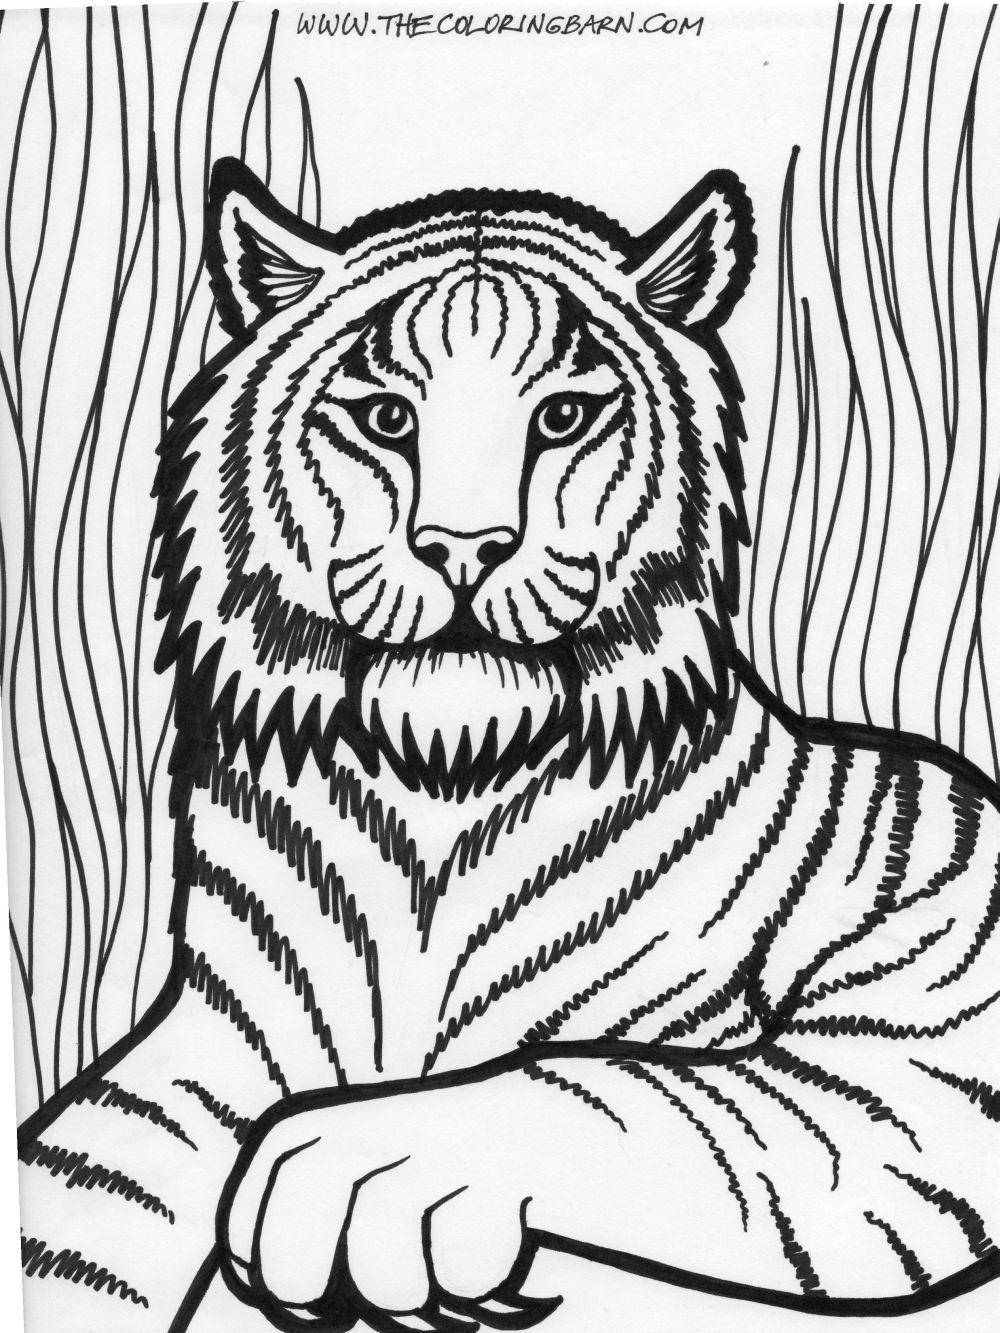 Lions Coloring Pages Coloring Kids - Coloring Kids